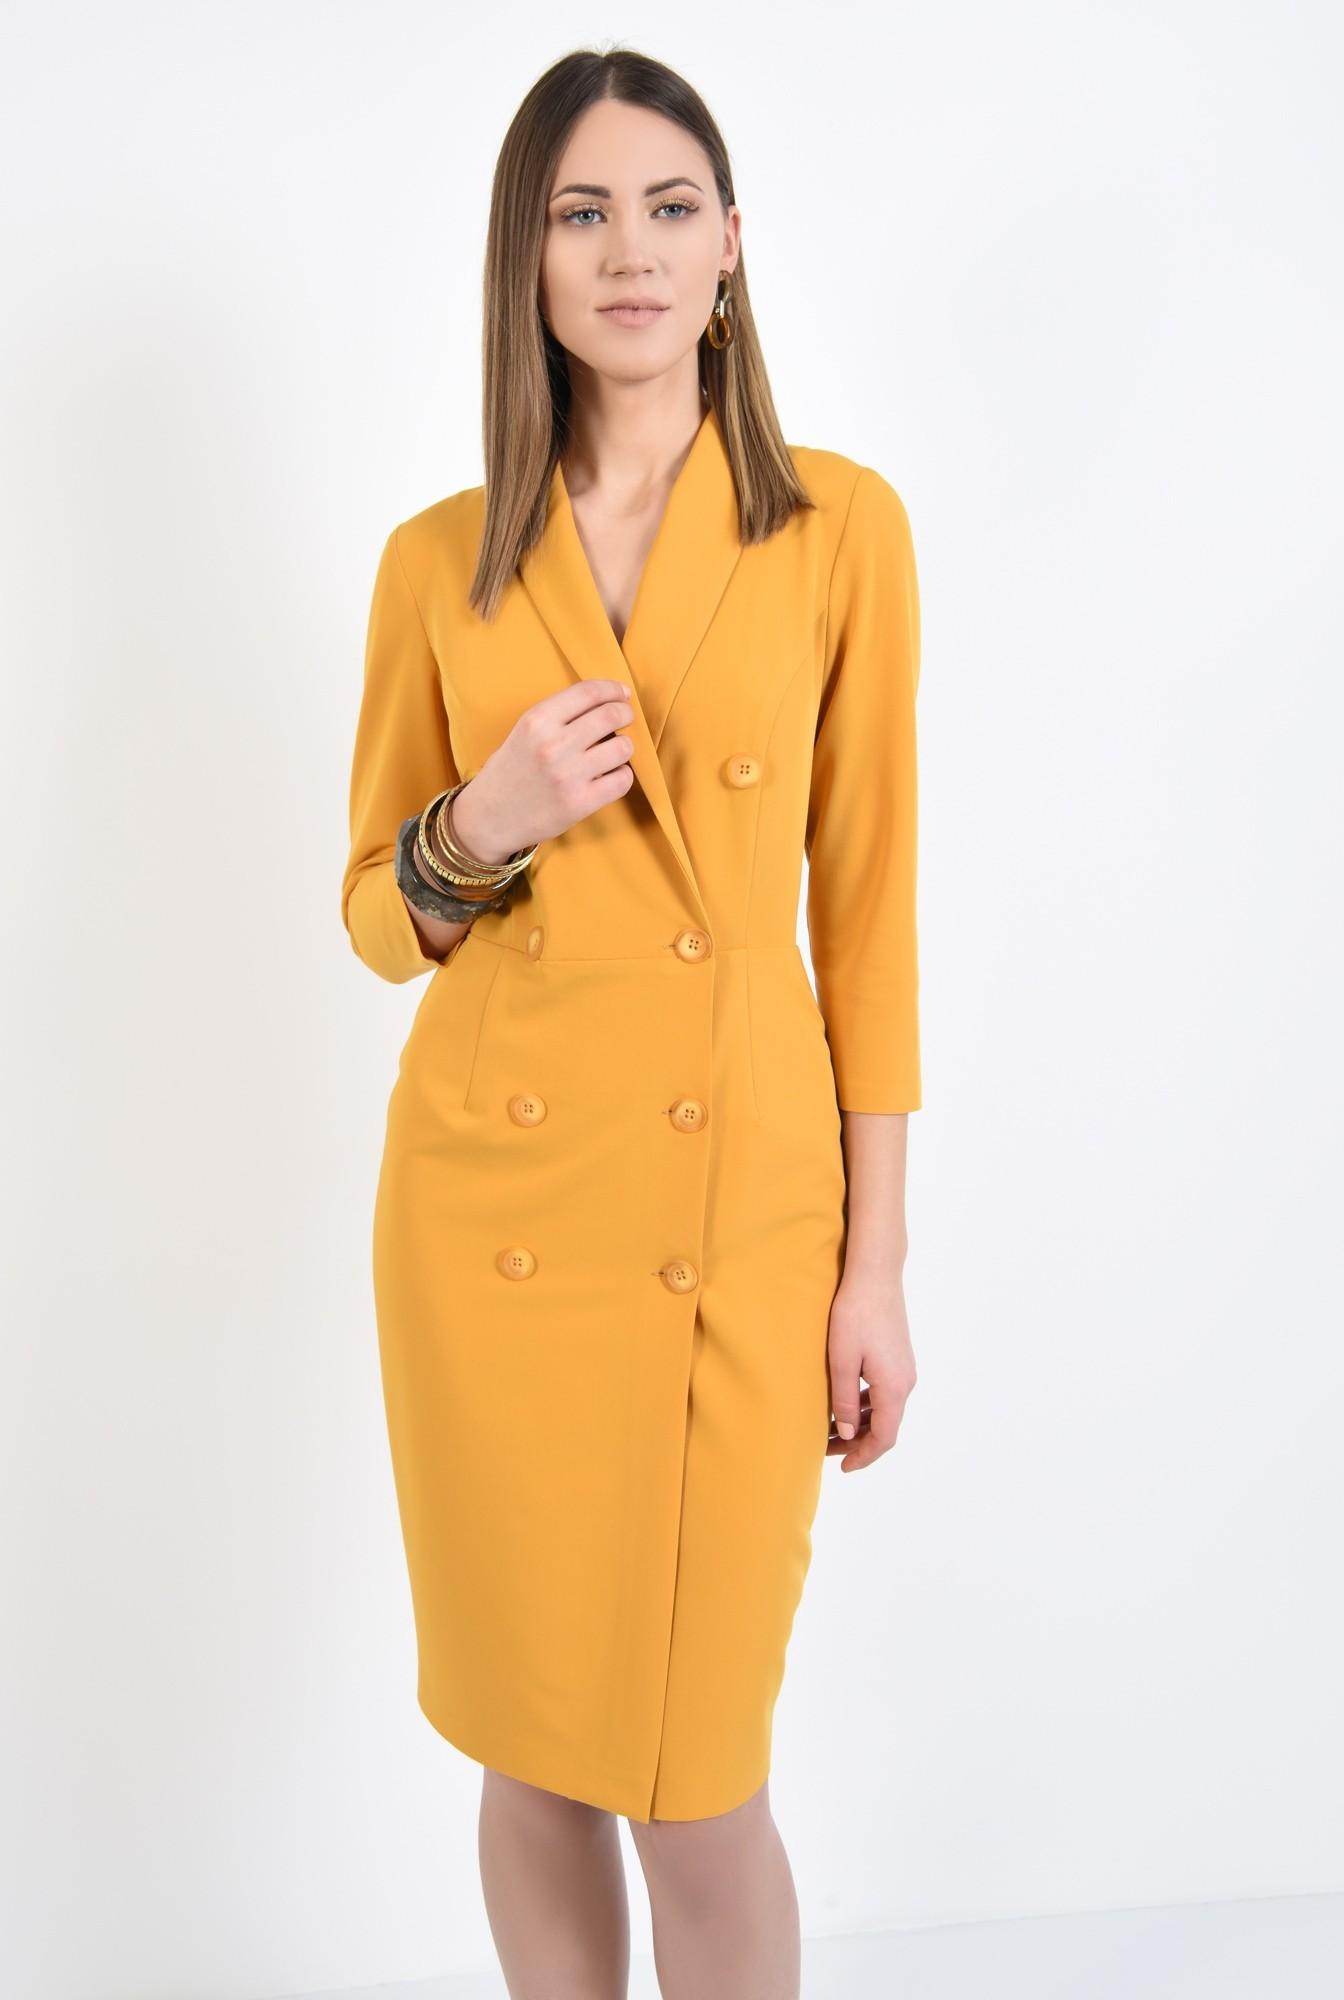 2 - 360 - rochie eleganta, conica, midi, galbena, mustar, rochie office